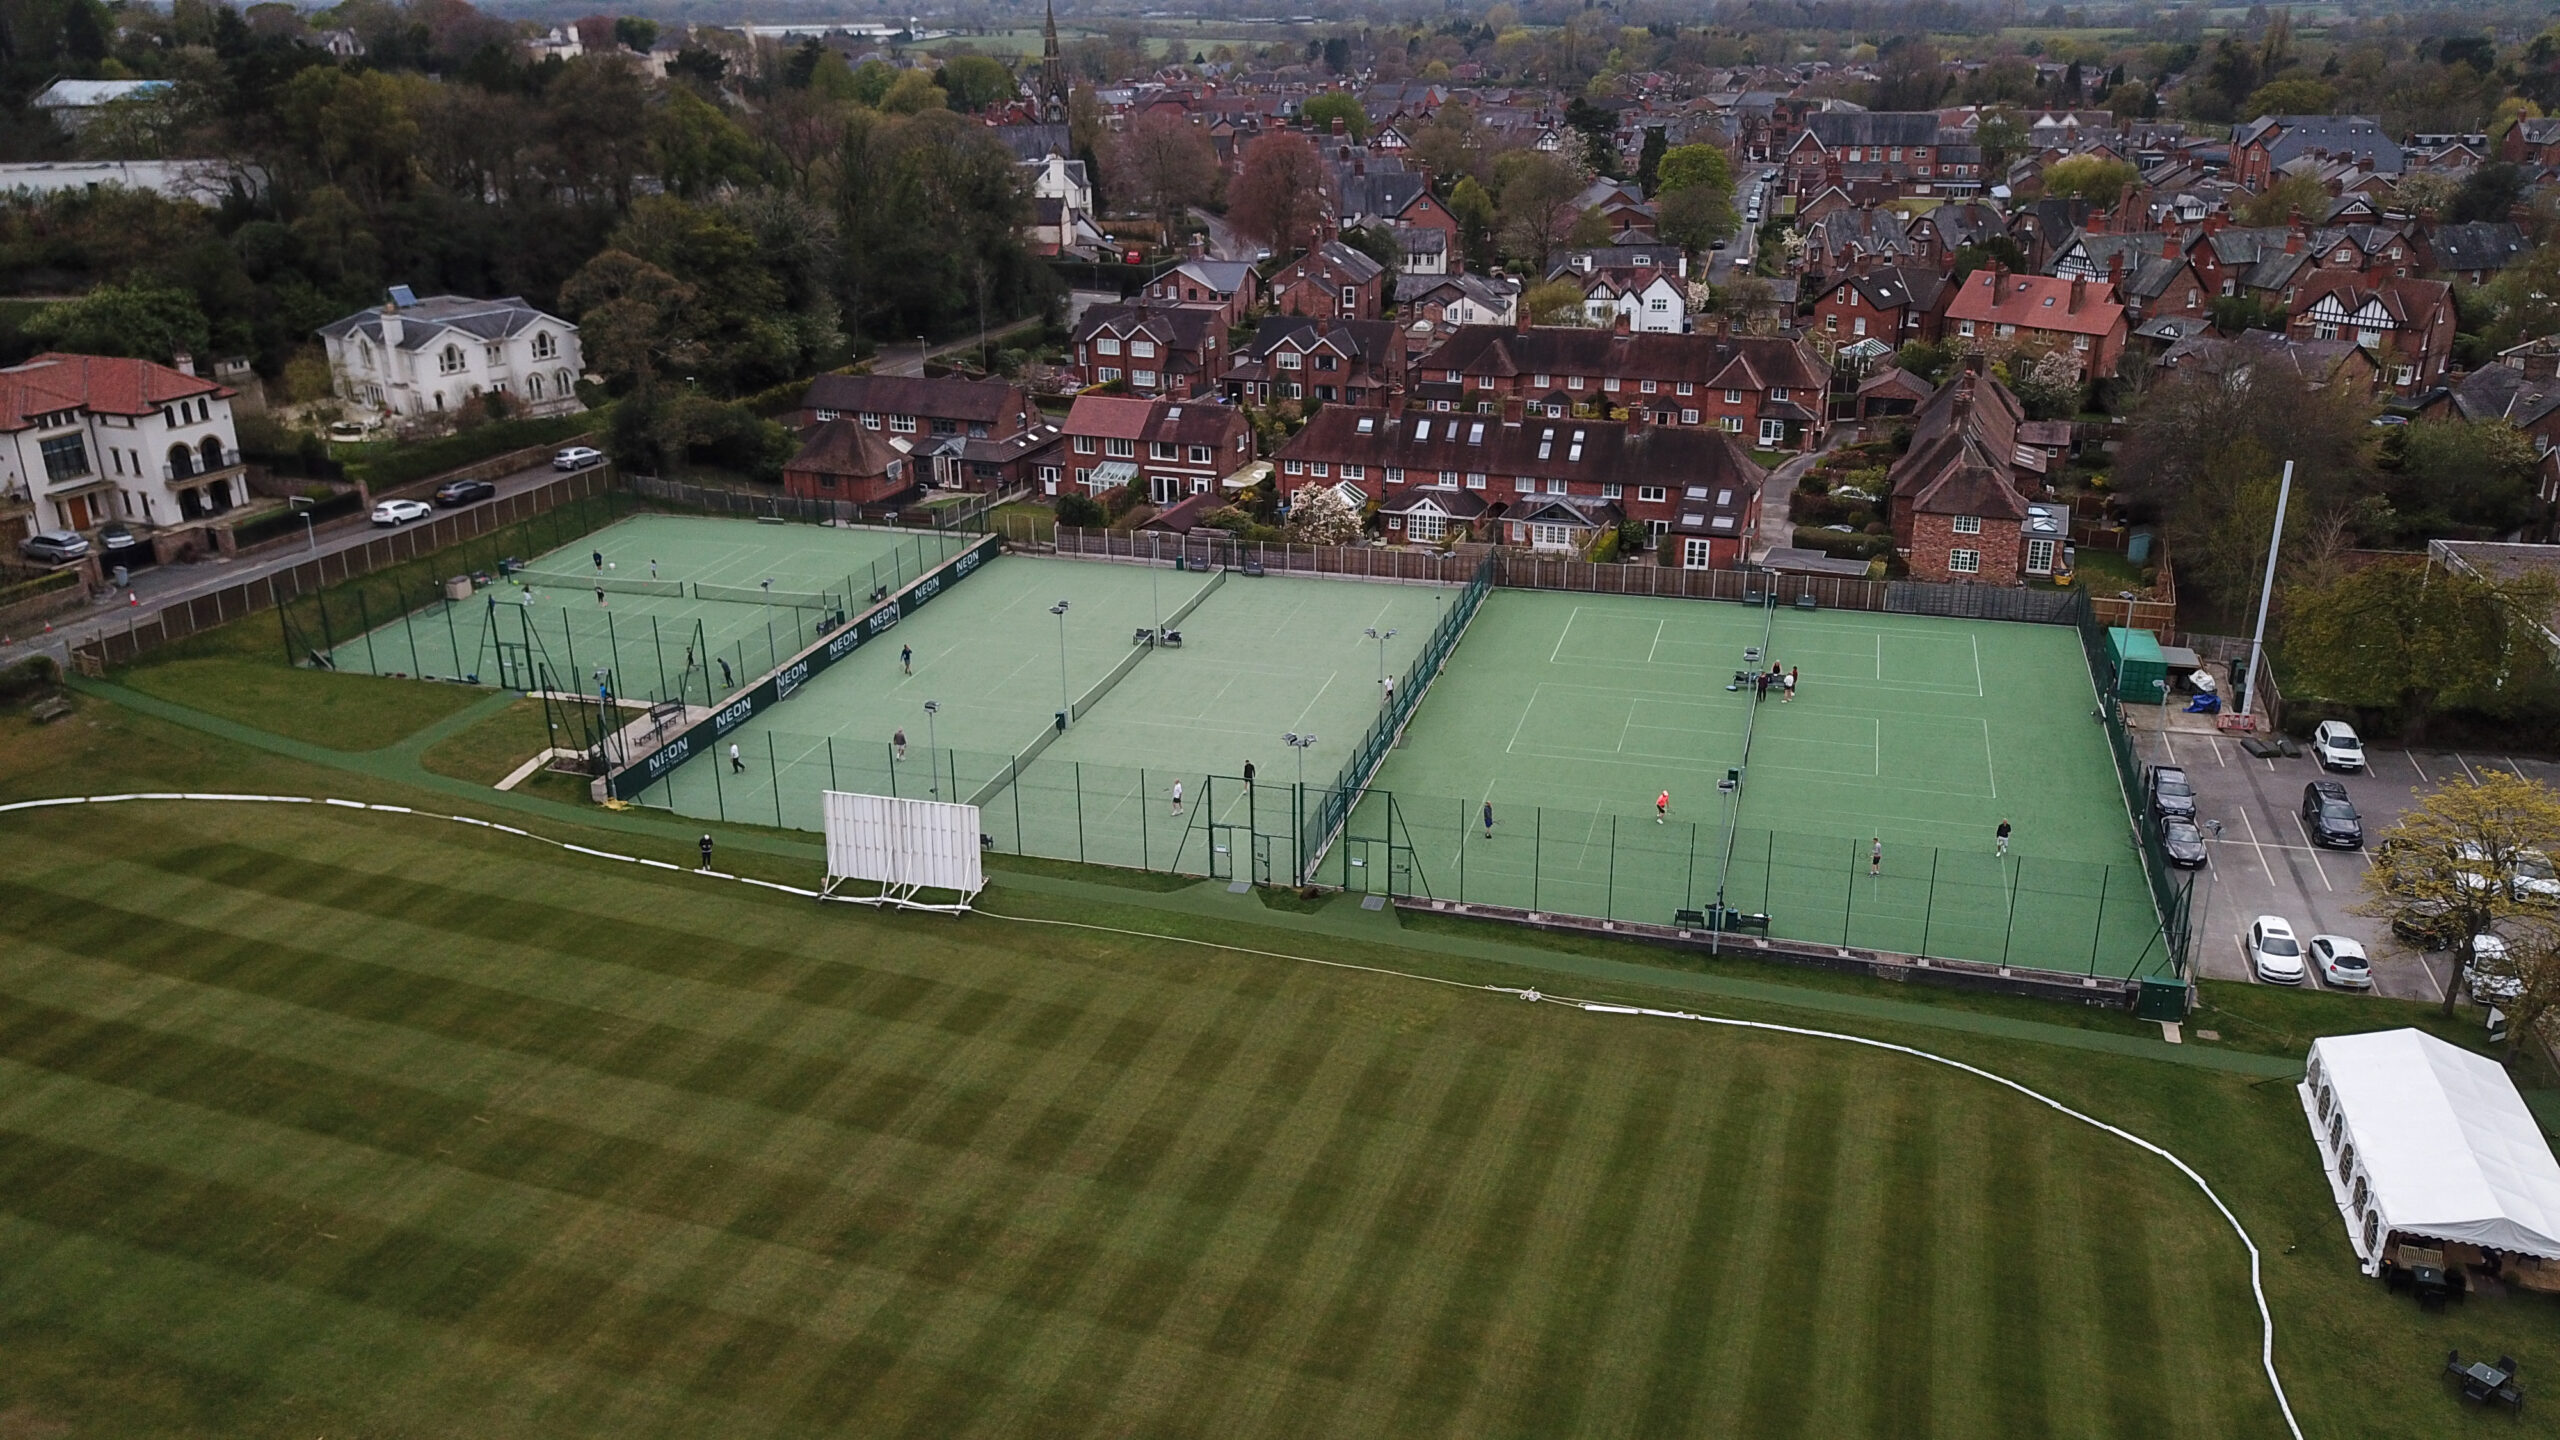 alderley edge tennis club